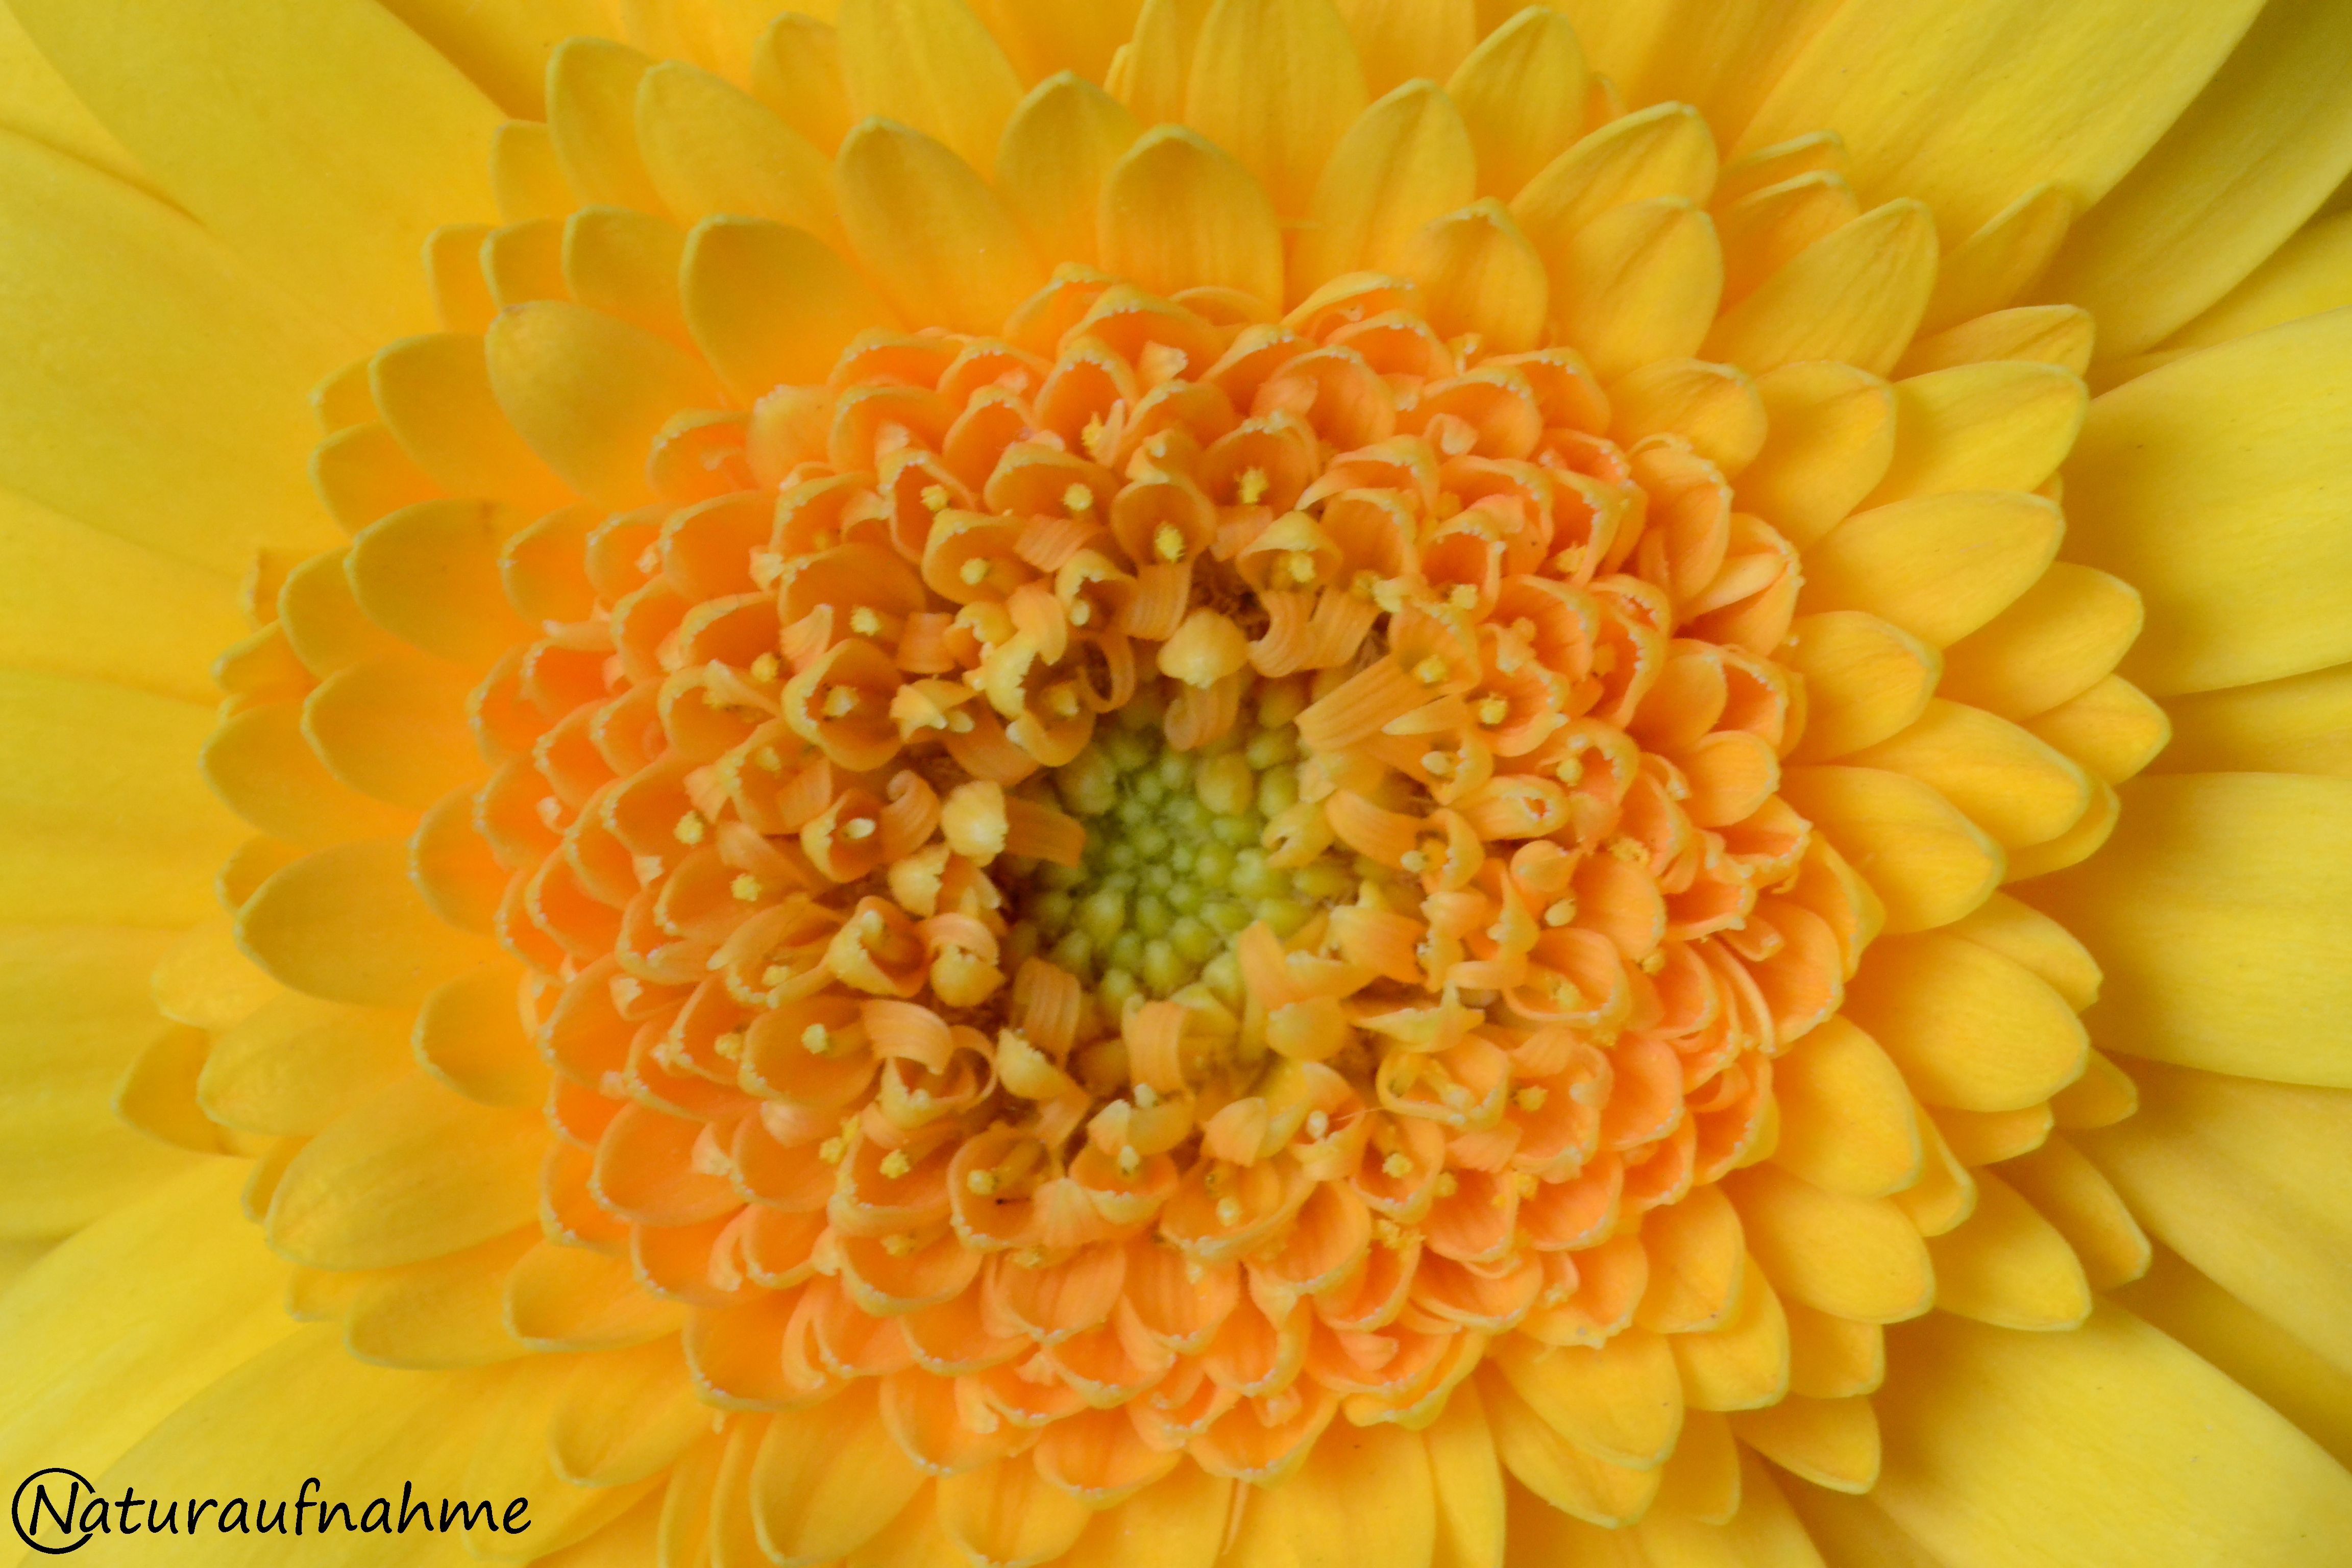 Fotos © by Silke Winter: Gelbe Blume (Nahaufnahme) - www.natur-aufnahme.de